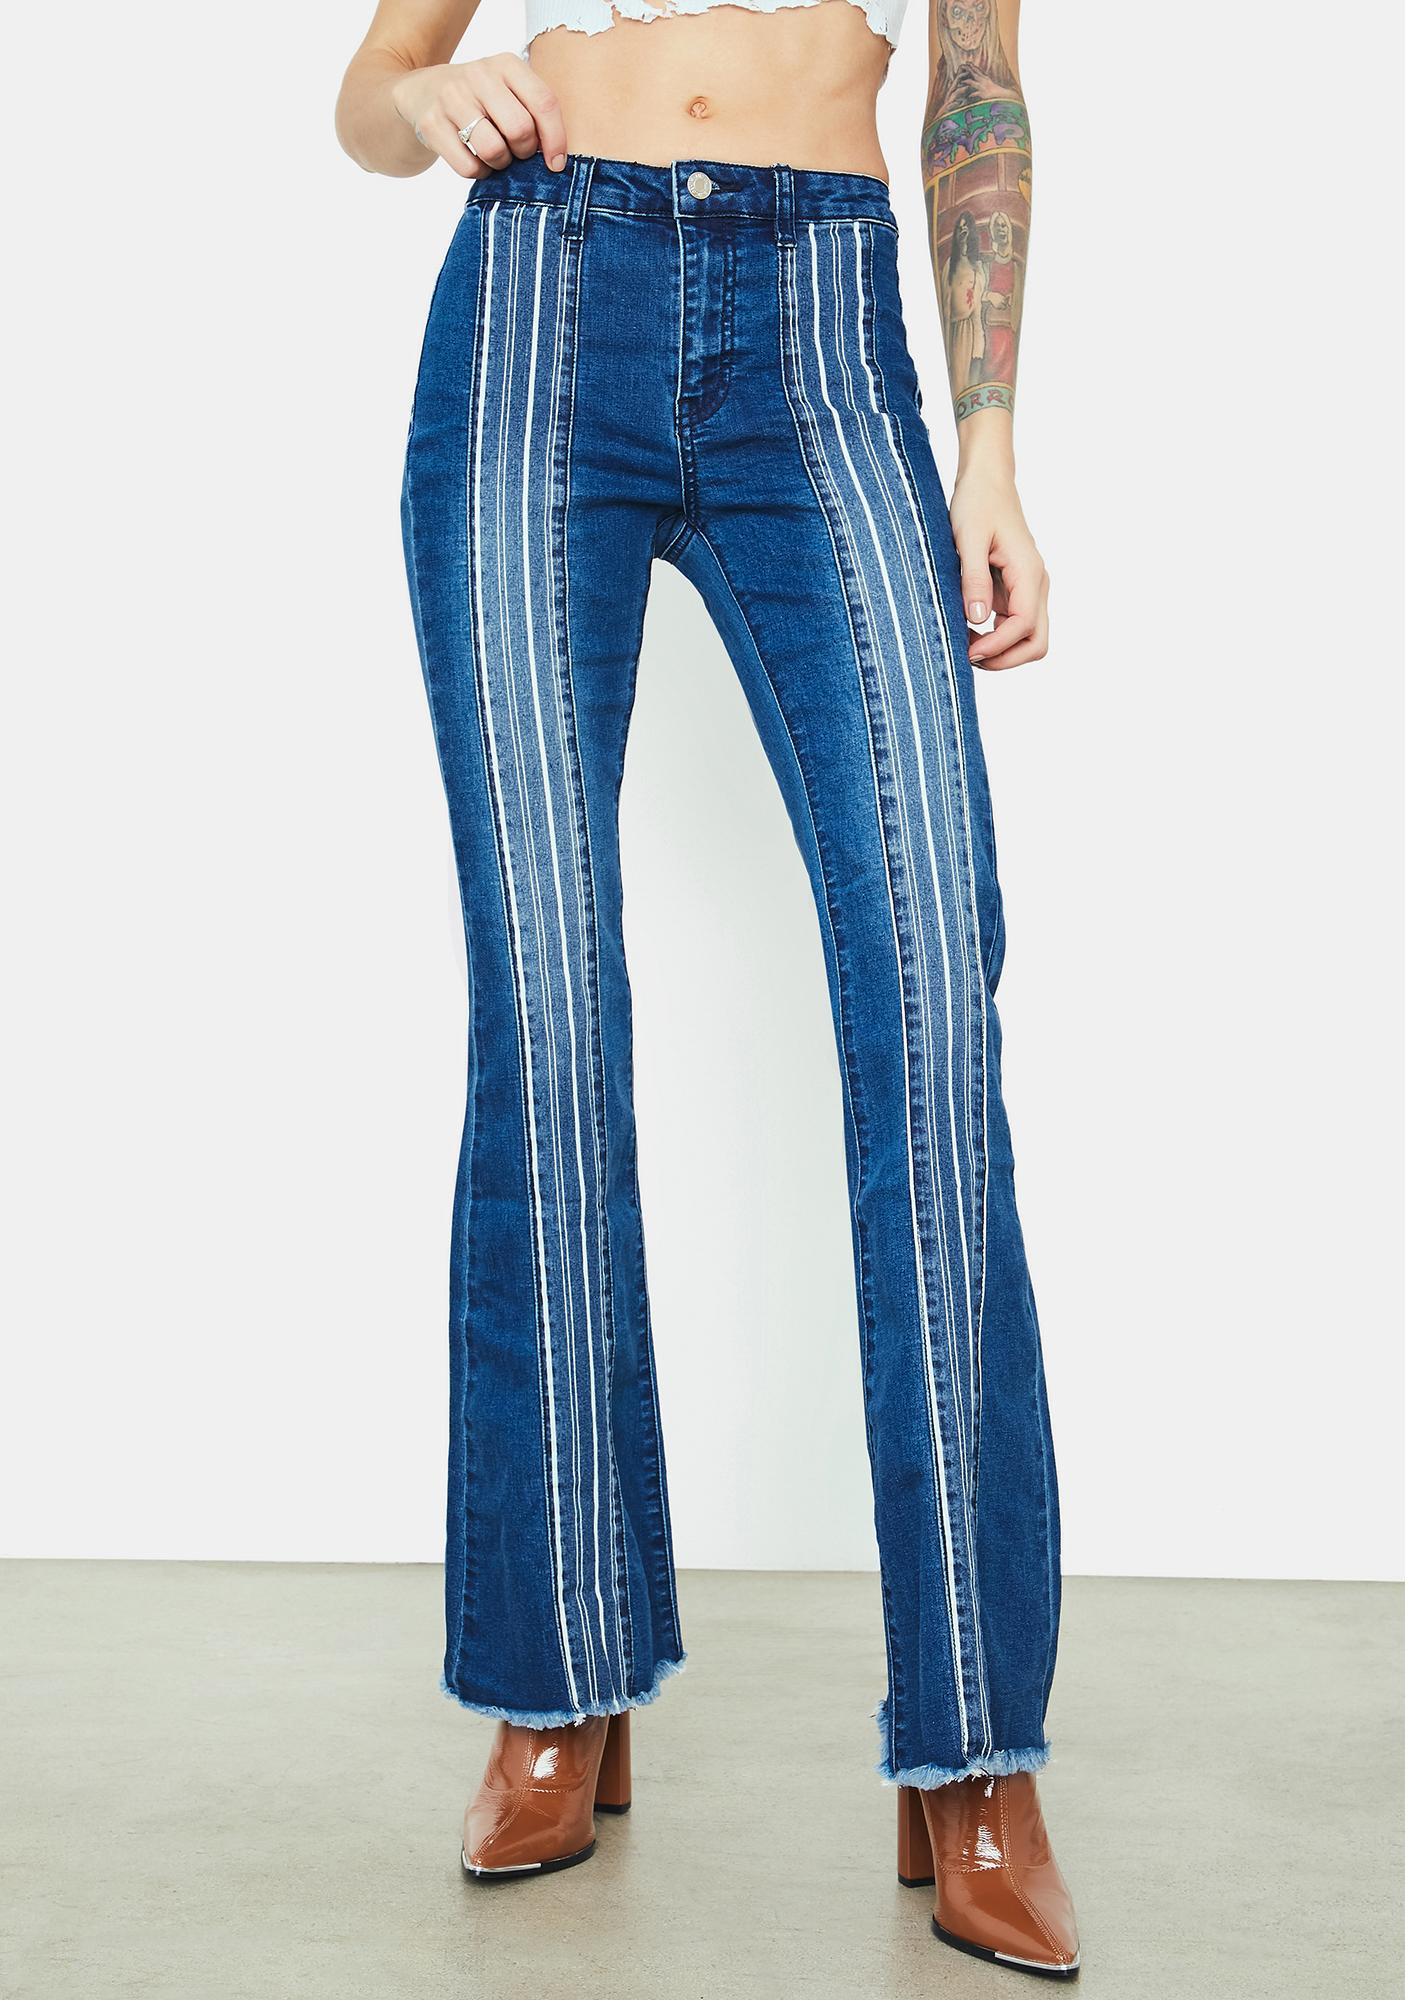 Retro Bae Striped Patch Flare Jeans